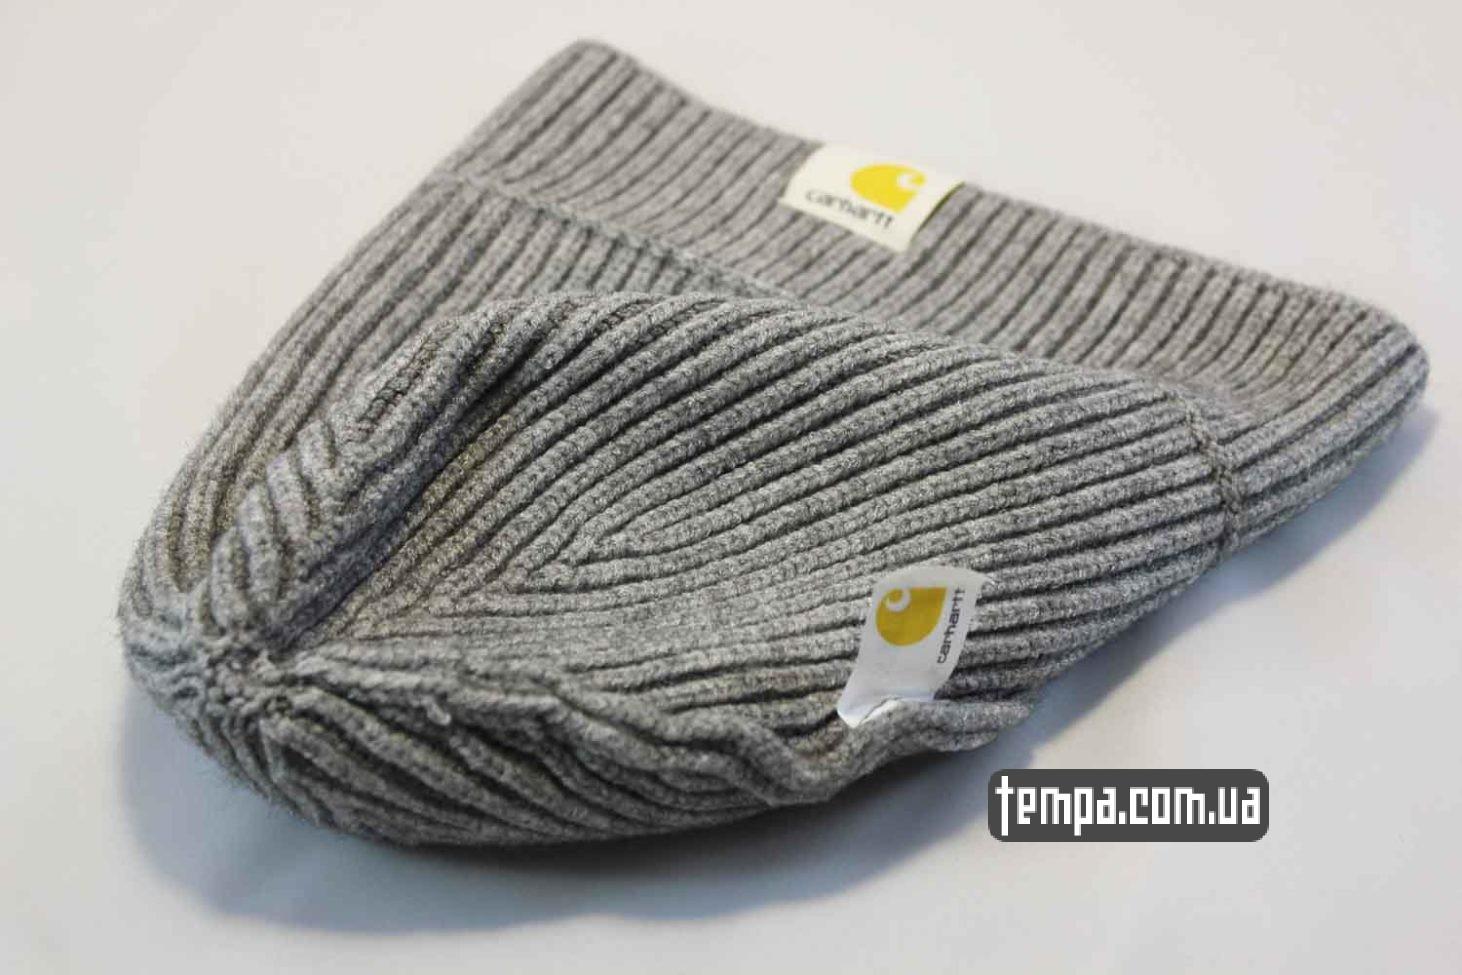 короткая теплая шерстяная зимняя шапка beanie Carhartt grey серая купить магазин